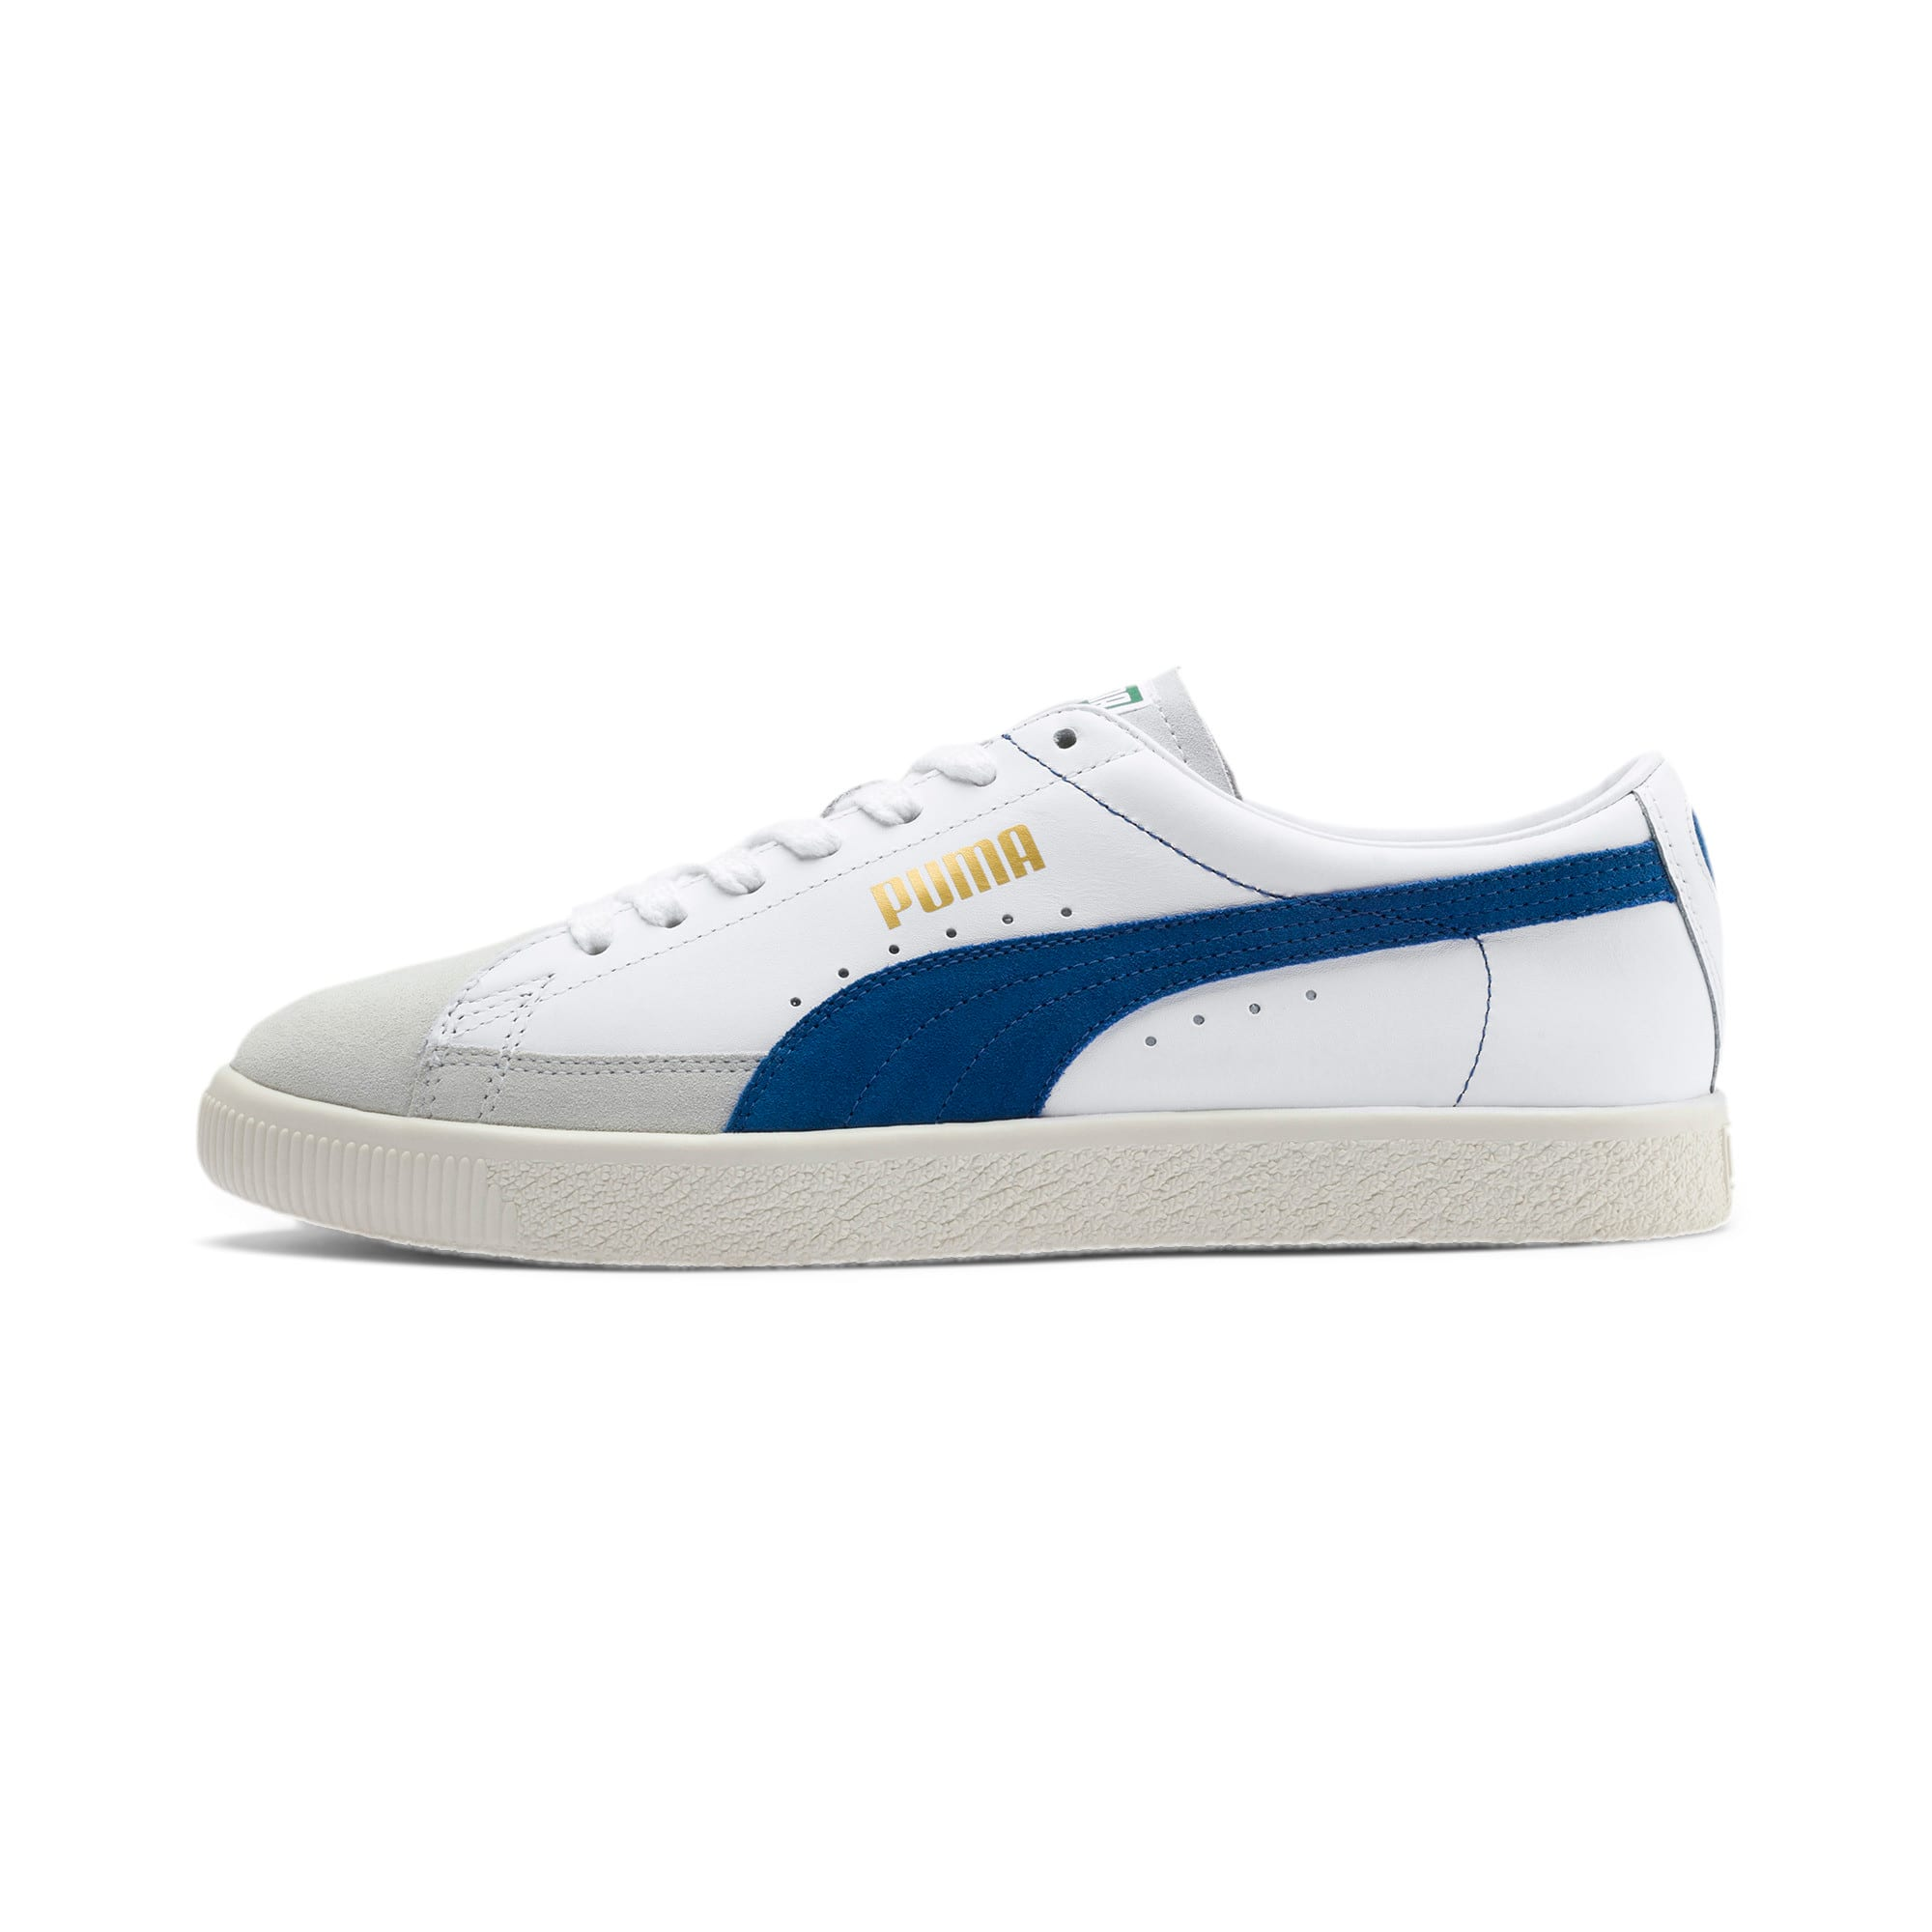 Miniatura 1 de Zapatos deportivosBasket 90680, Puma White-Galaxy Blue-Whisp, mediano